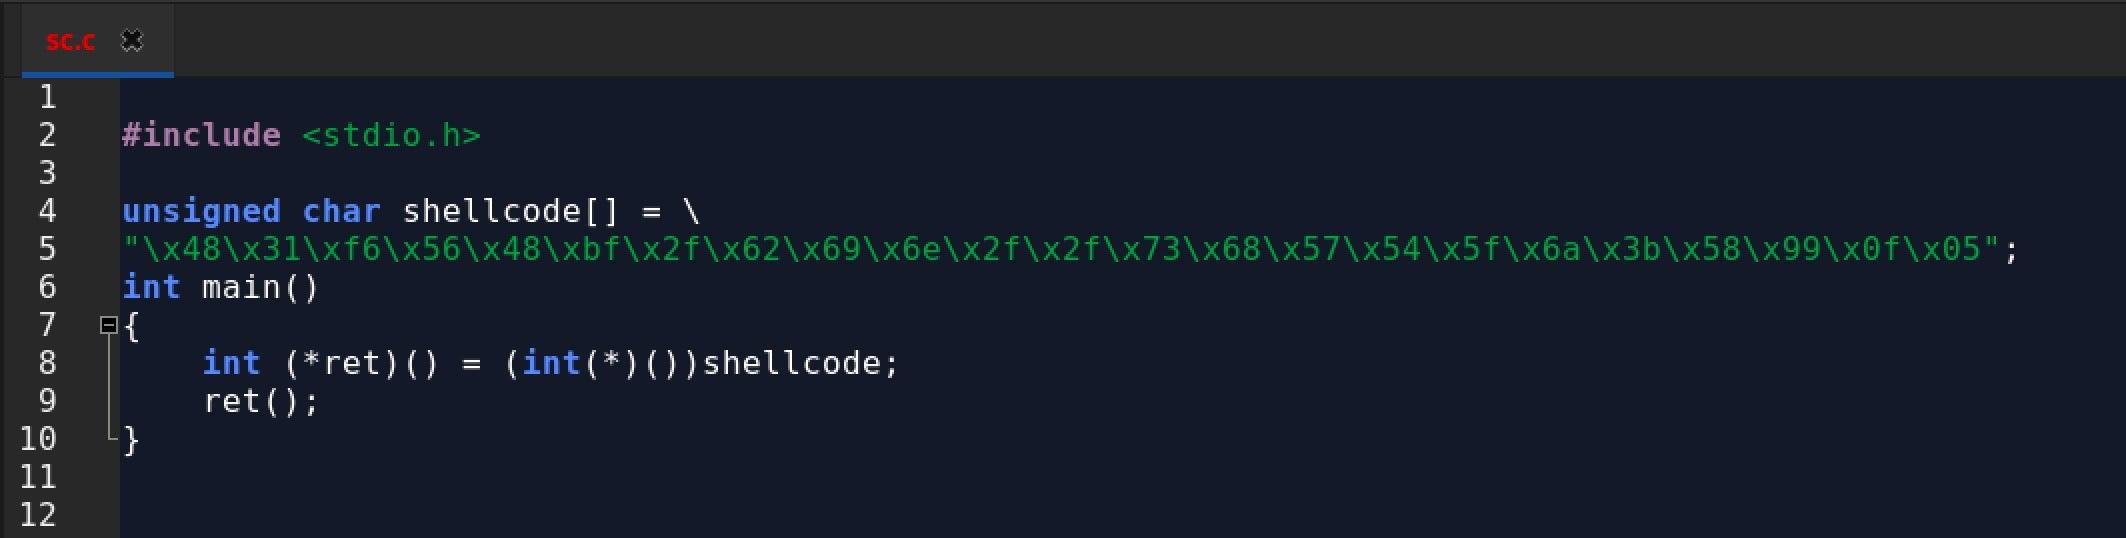 image of shellcode example